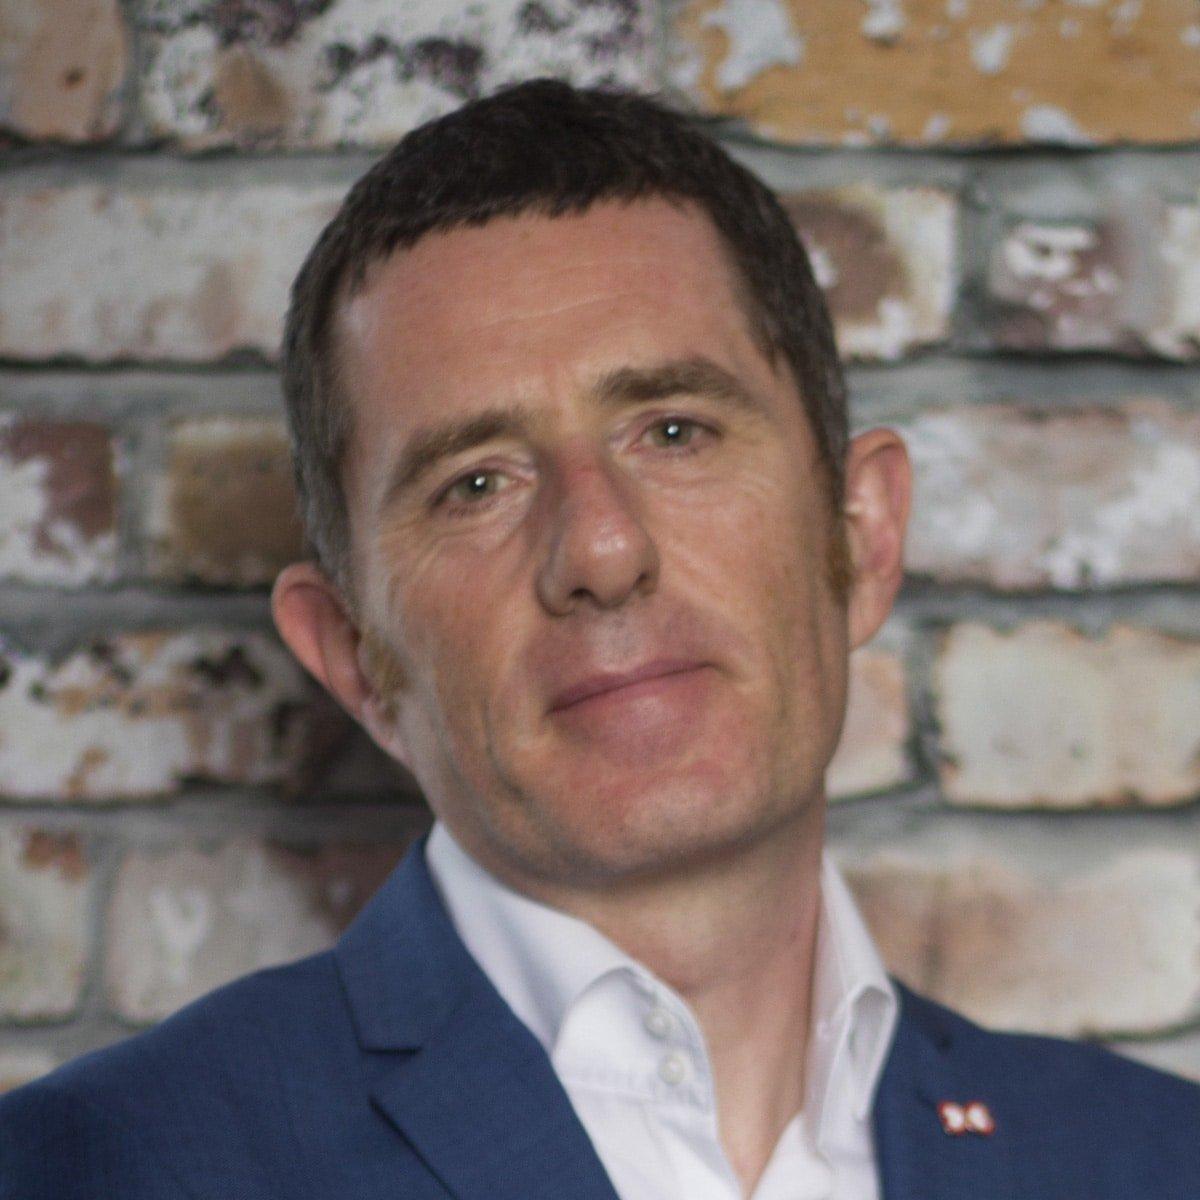 Phil-Jones-leadership-teamwork-culture-speaker-at-Great-British-Speakers